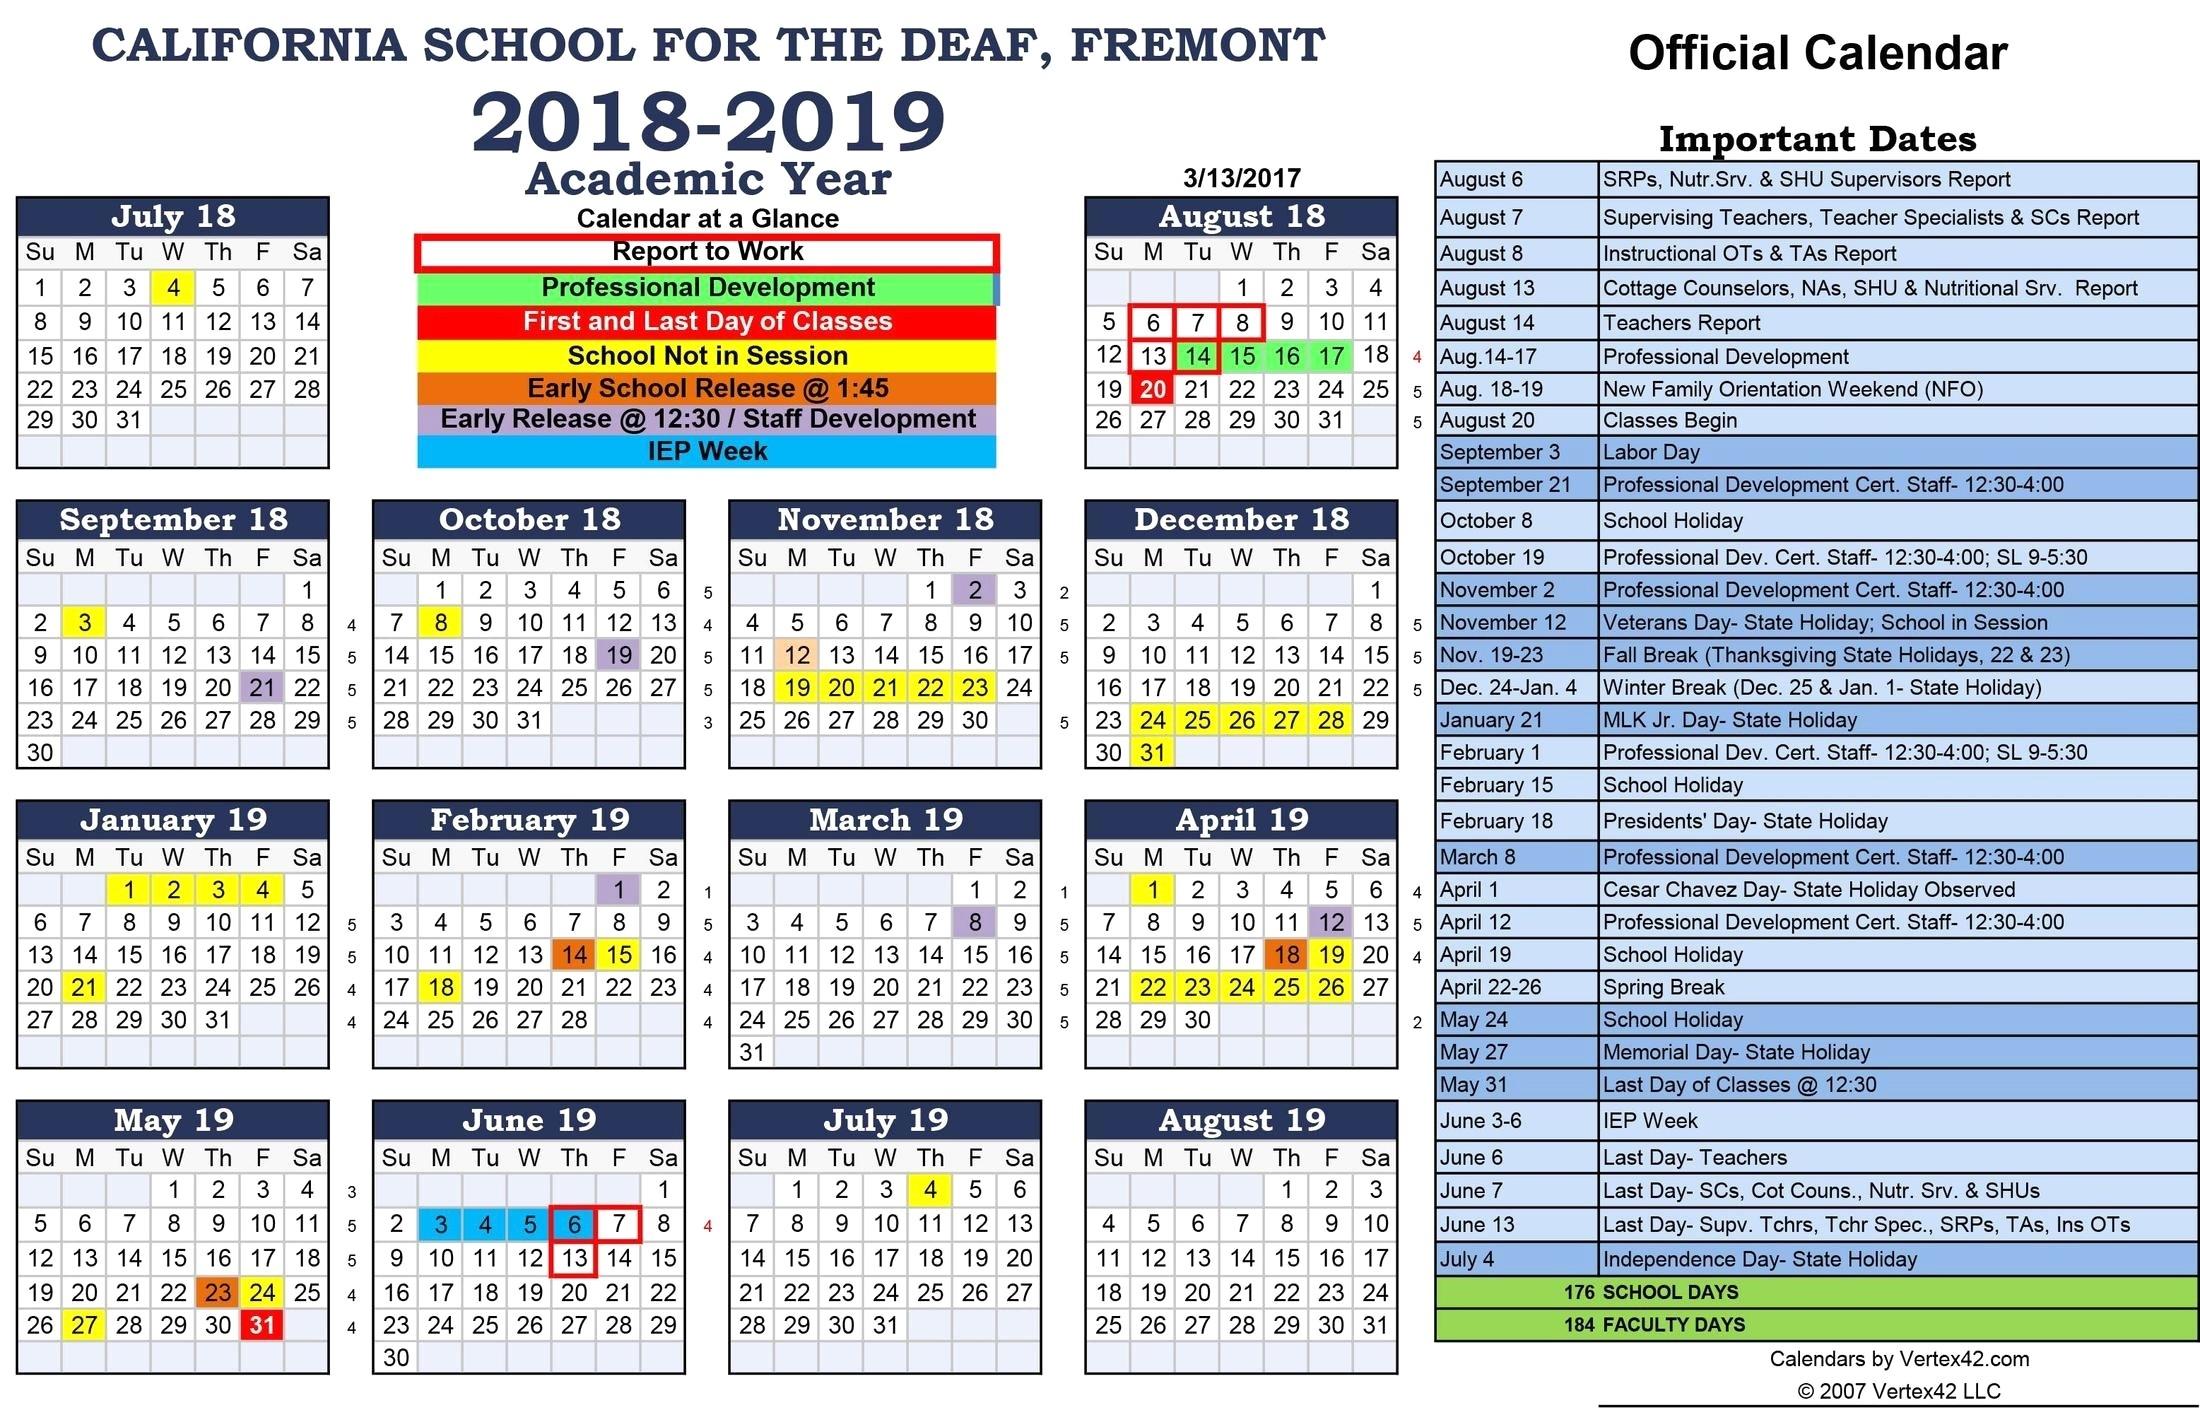 Uc Berkeley Academic Calendar 2017 18 What You Need To Know with Uc Berkeley Academic Calendar 2019-2020